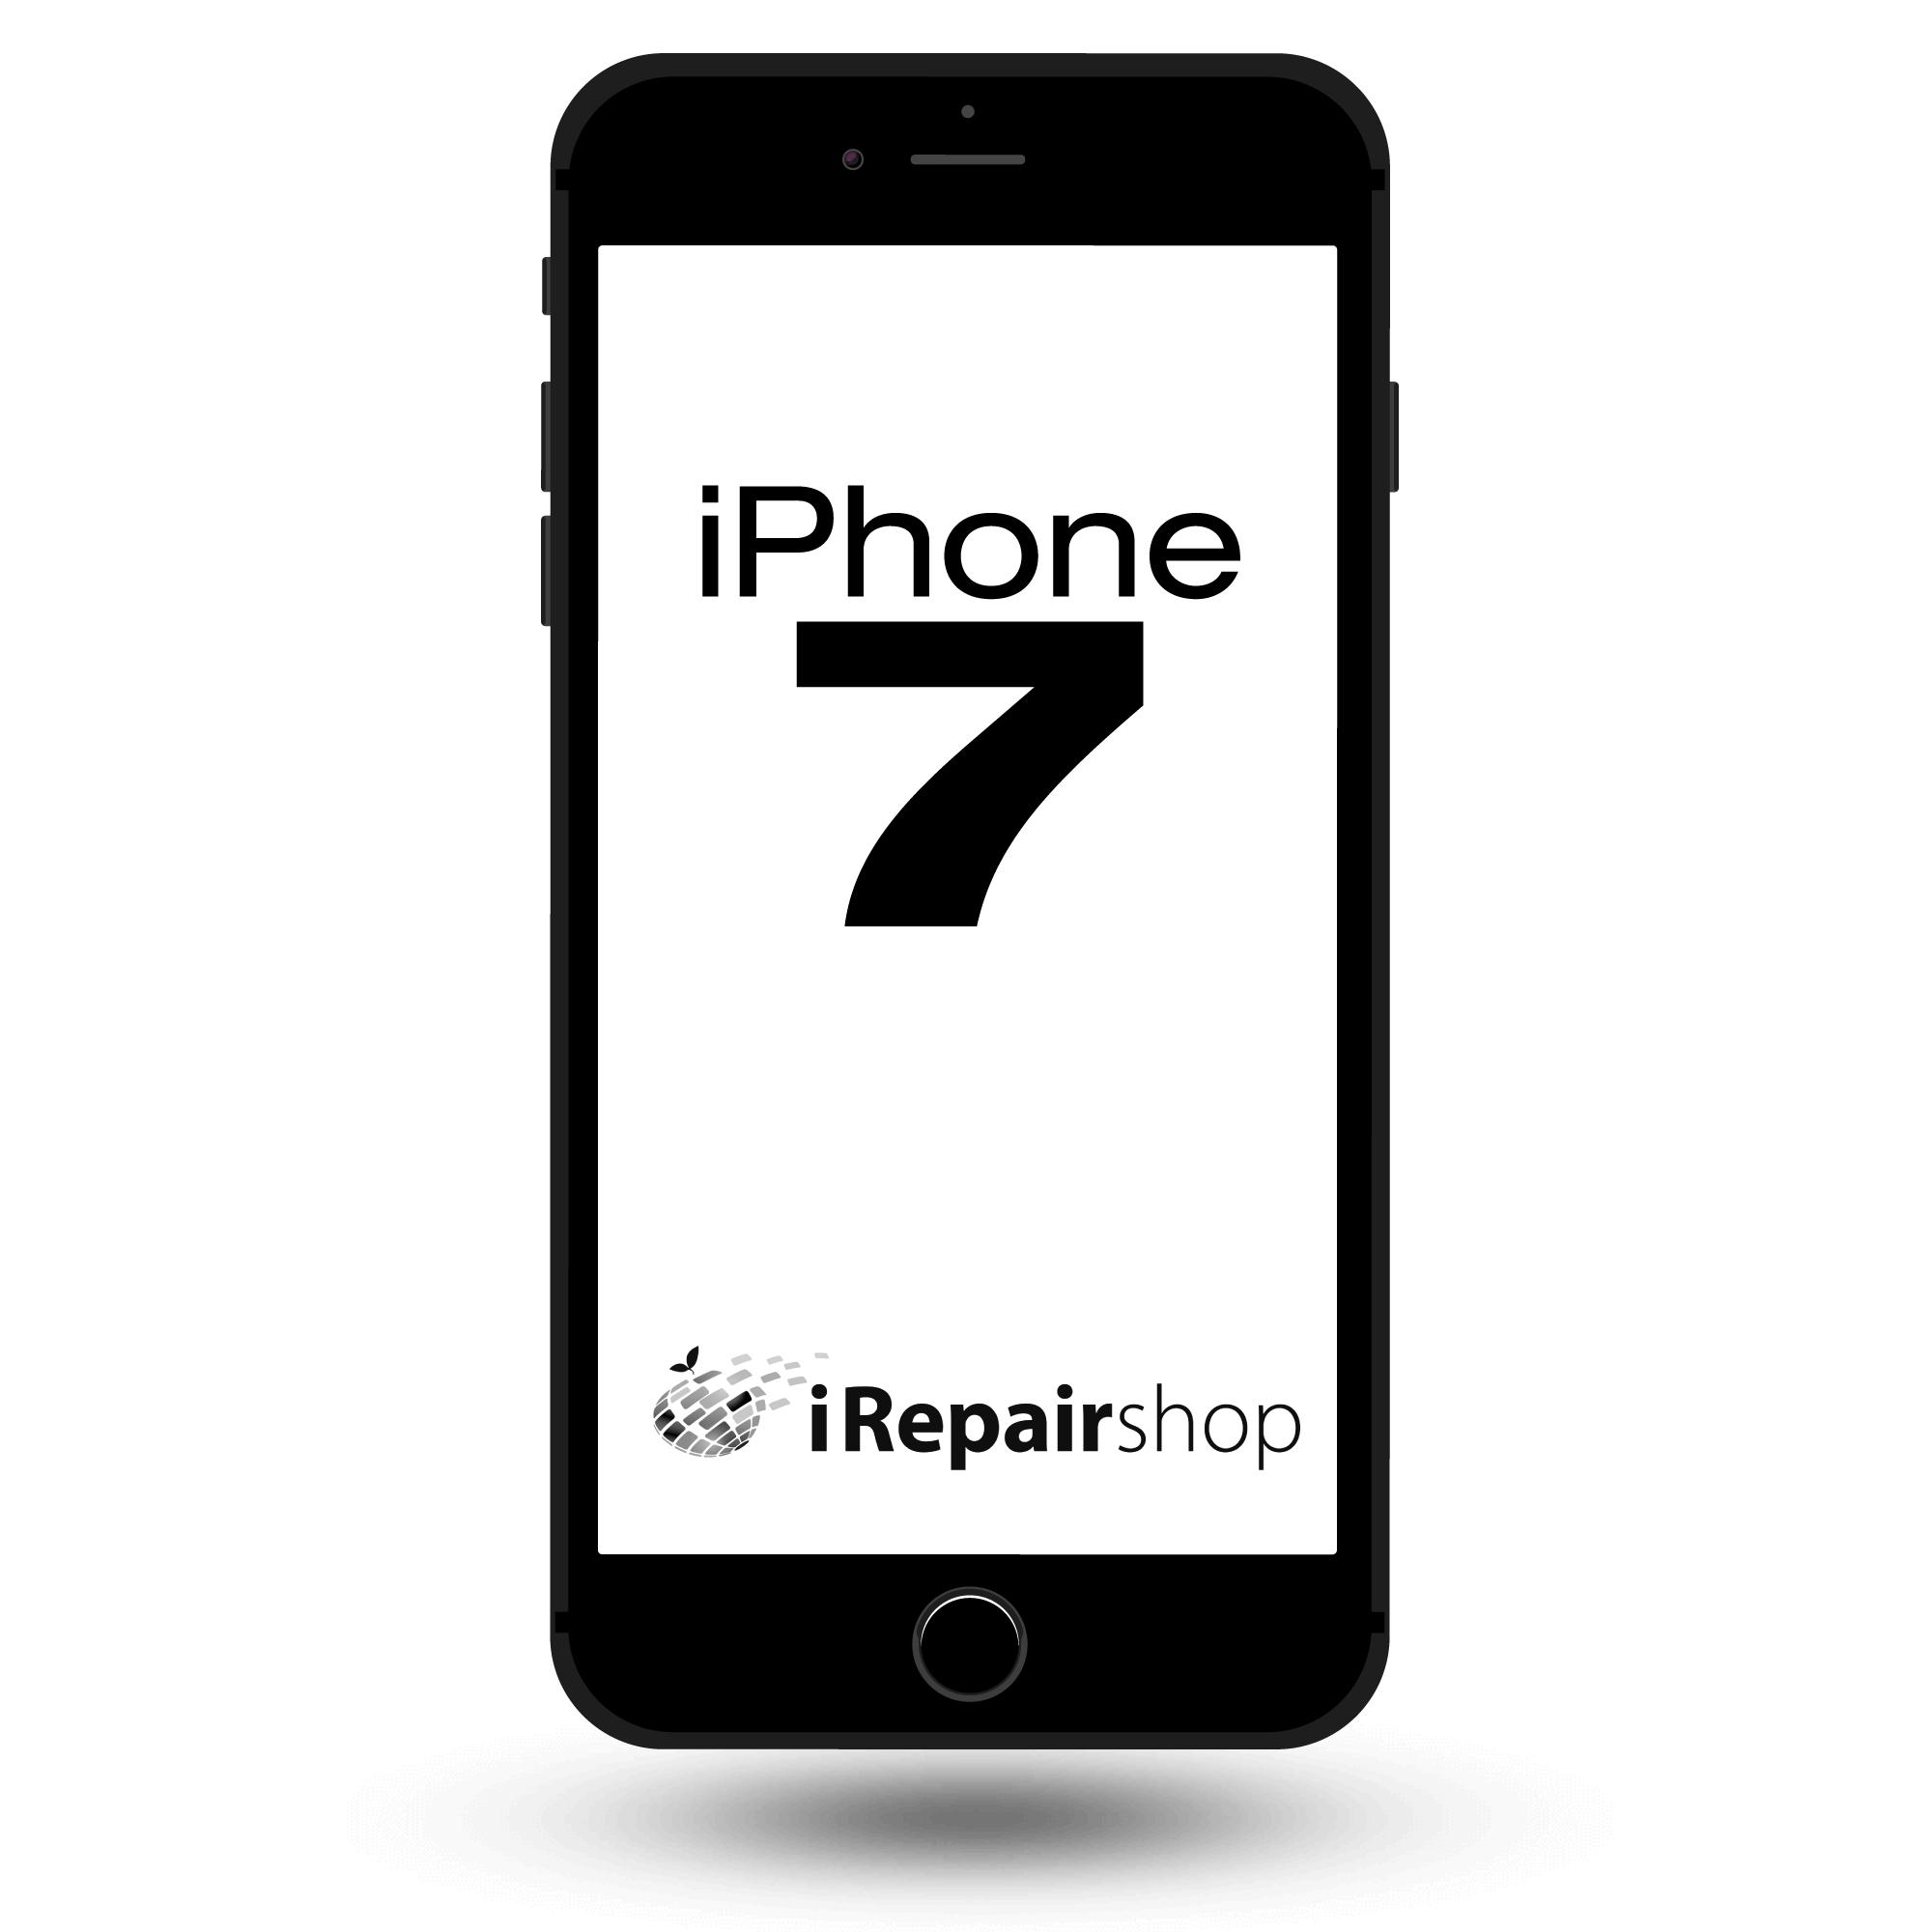 iphone 7 iphone kaputt irepairshop reparaturservice. Black Bedroom Furniture Sets. Home Design Ideas